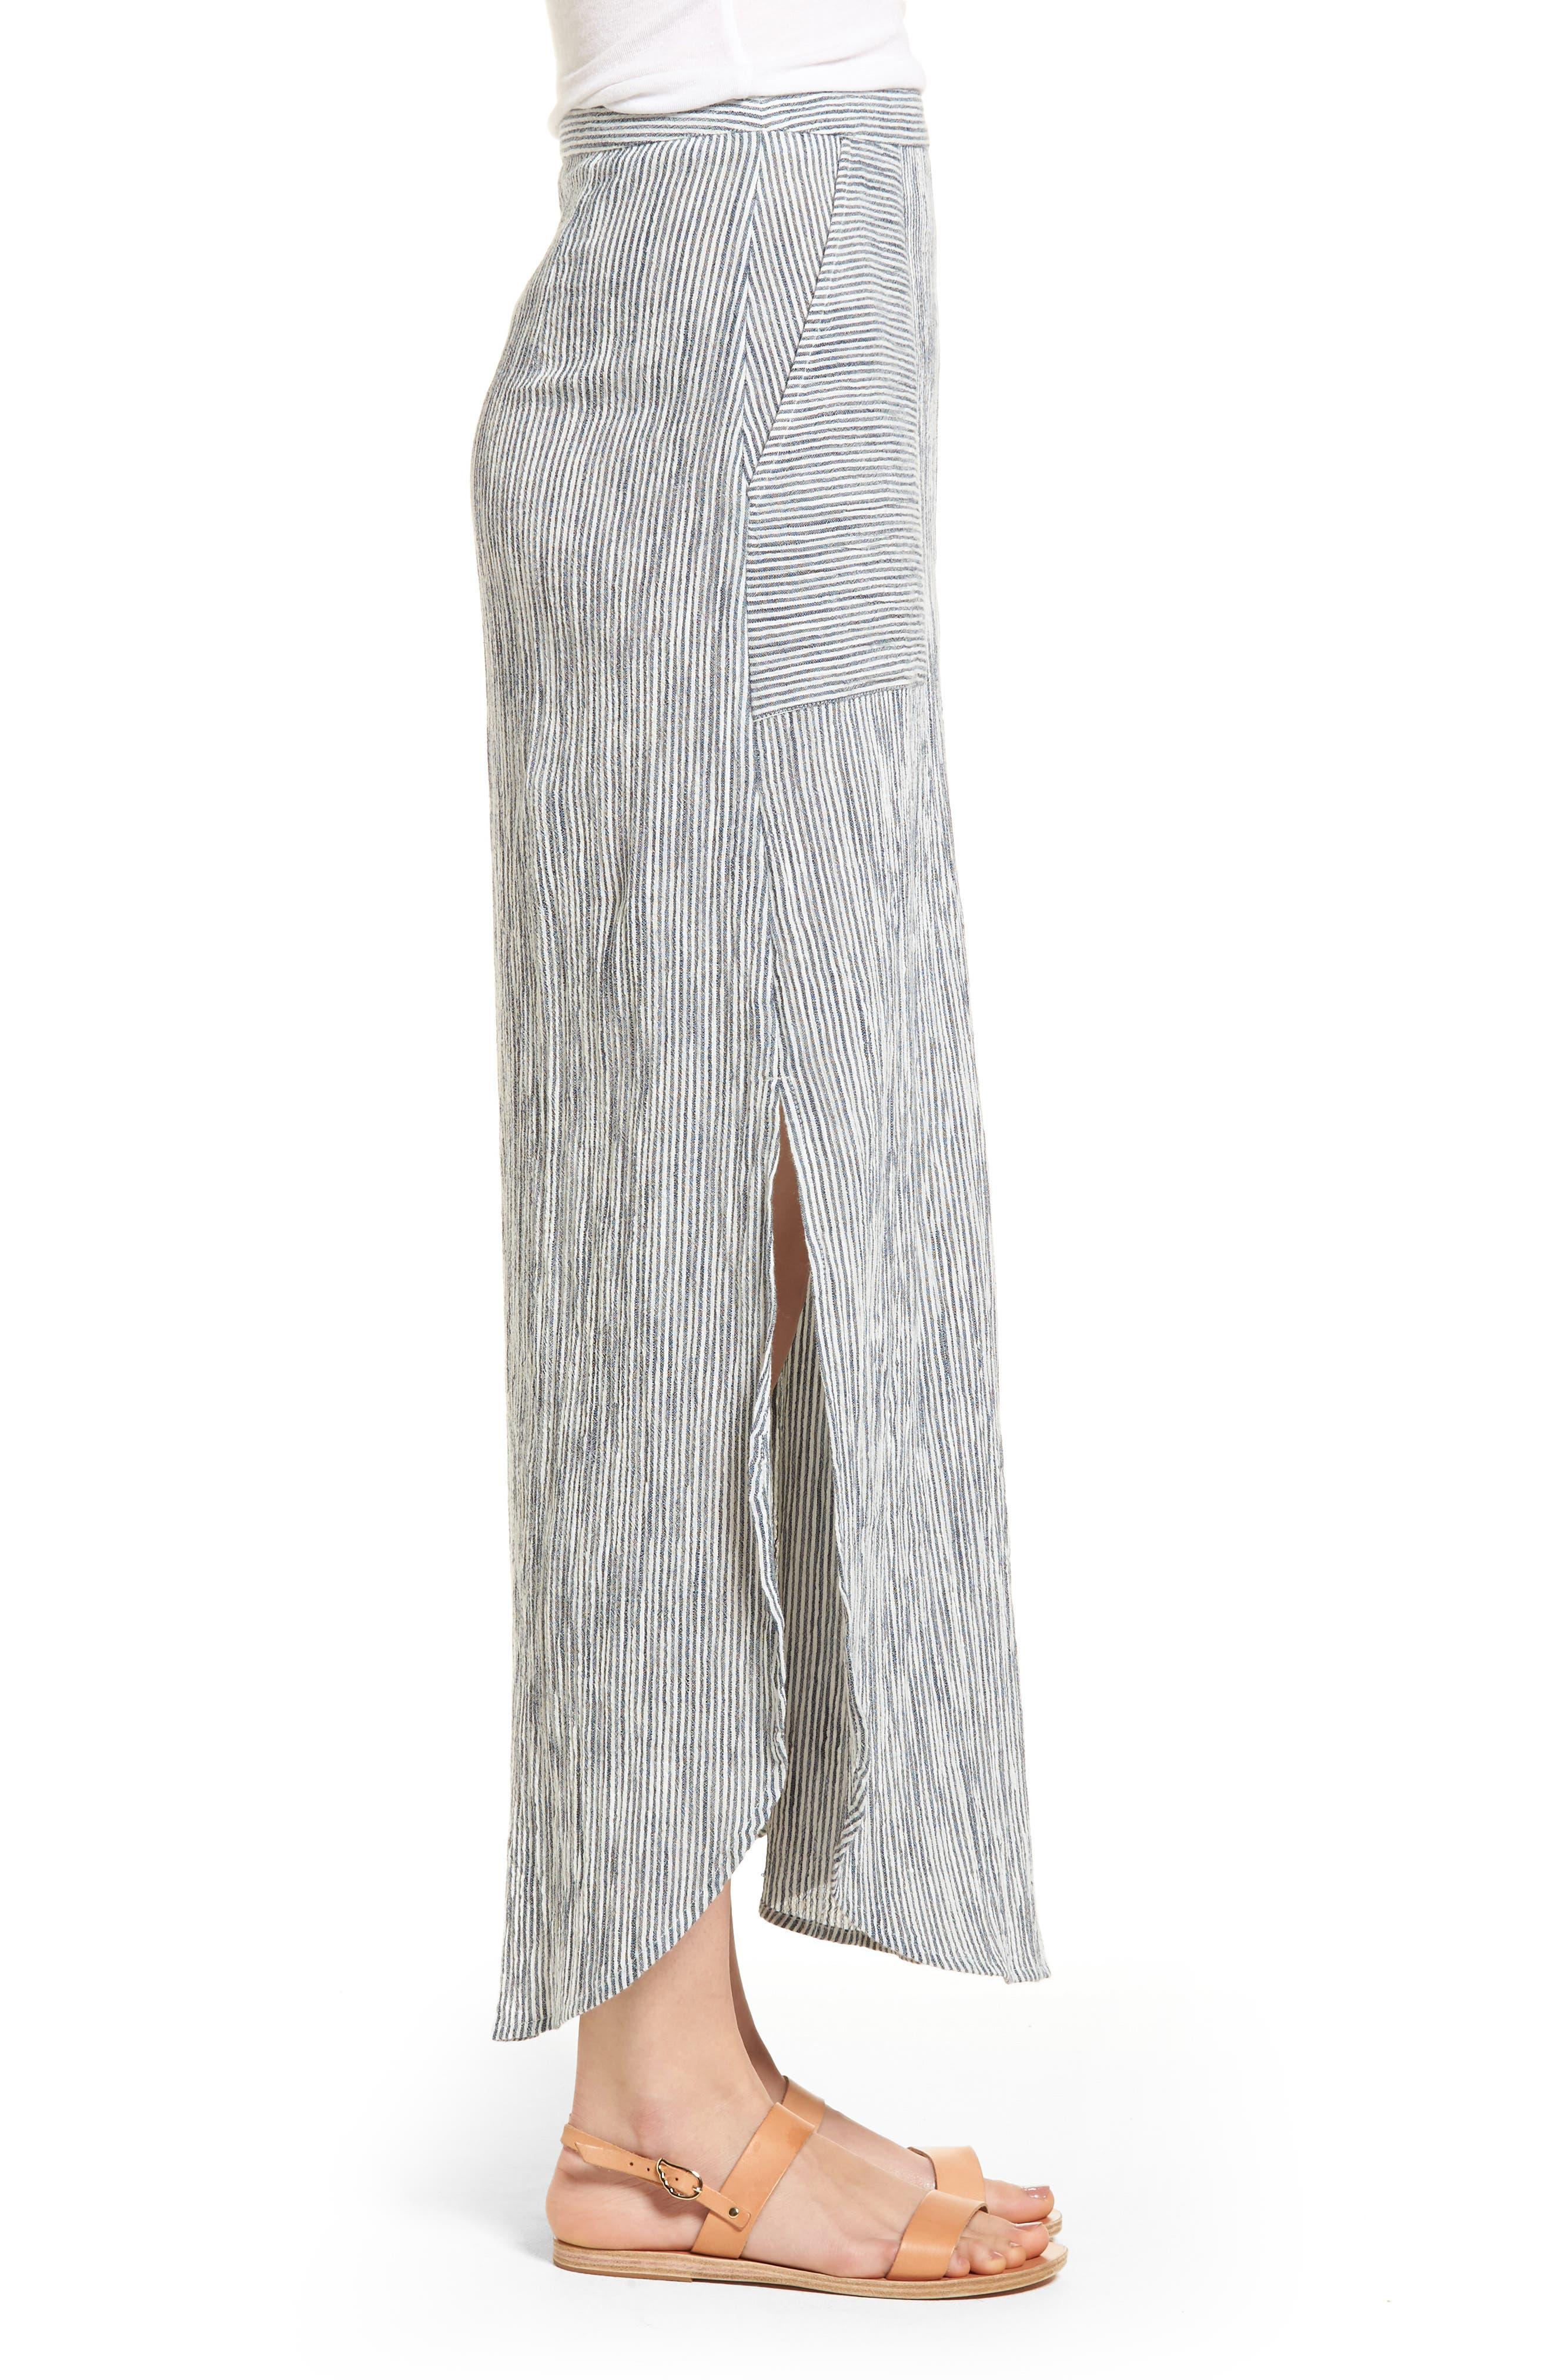 Sunset Islands Pinstripe Maxi Skirt,                             Alternate thumbnail 3, color,                             101